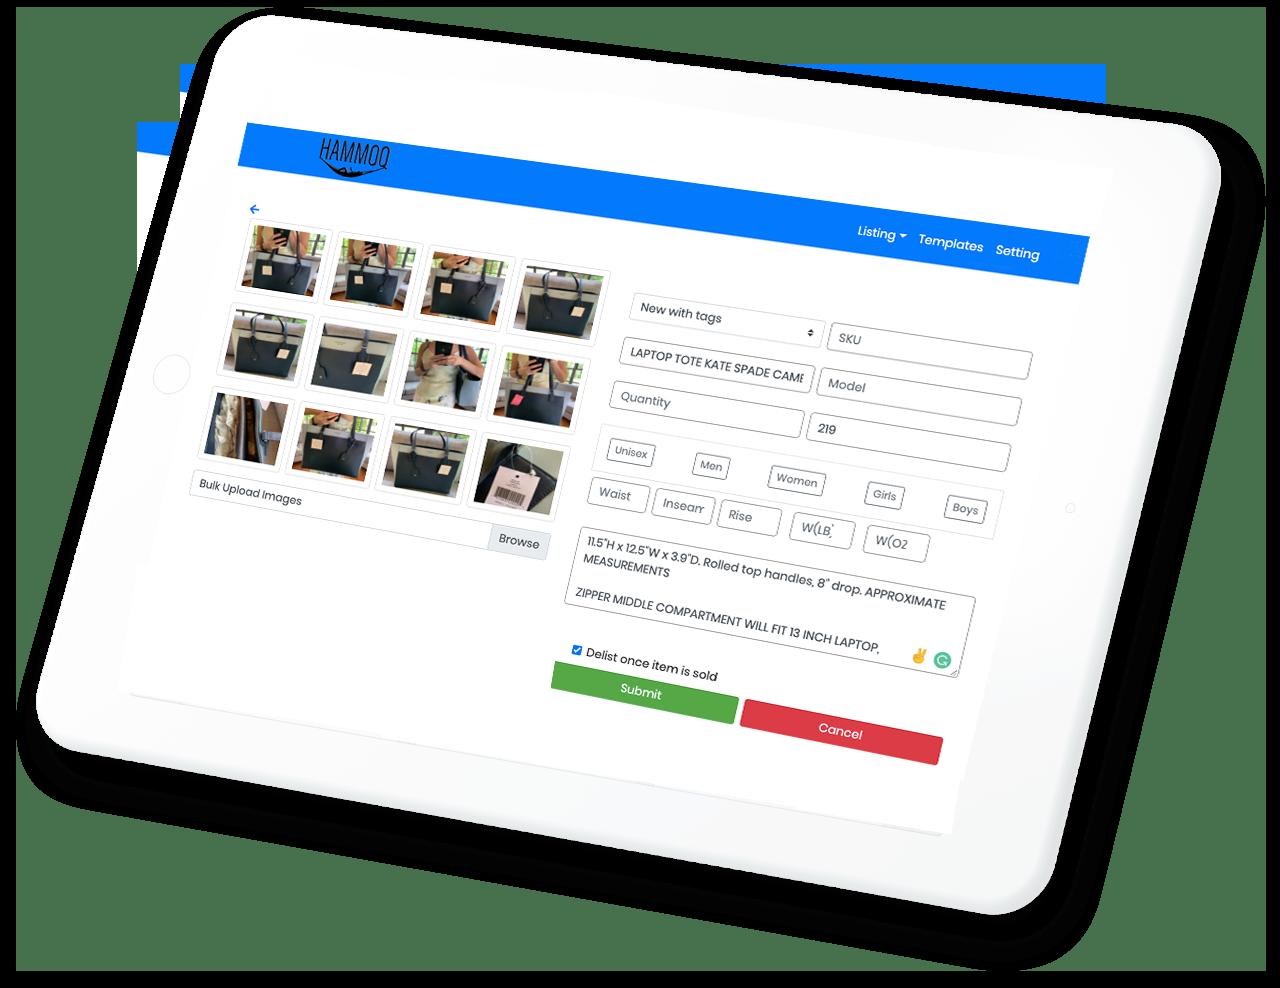 Hammoq Software that Auto Lists on eBay, poshmark, amazon, Depop